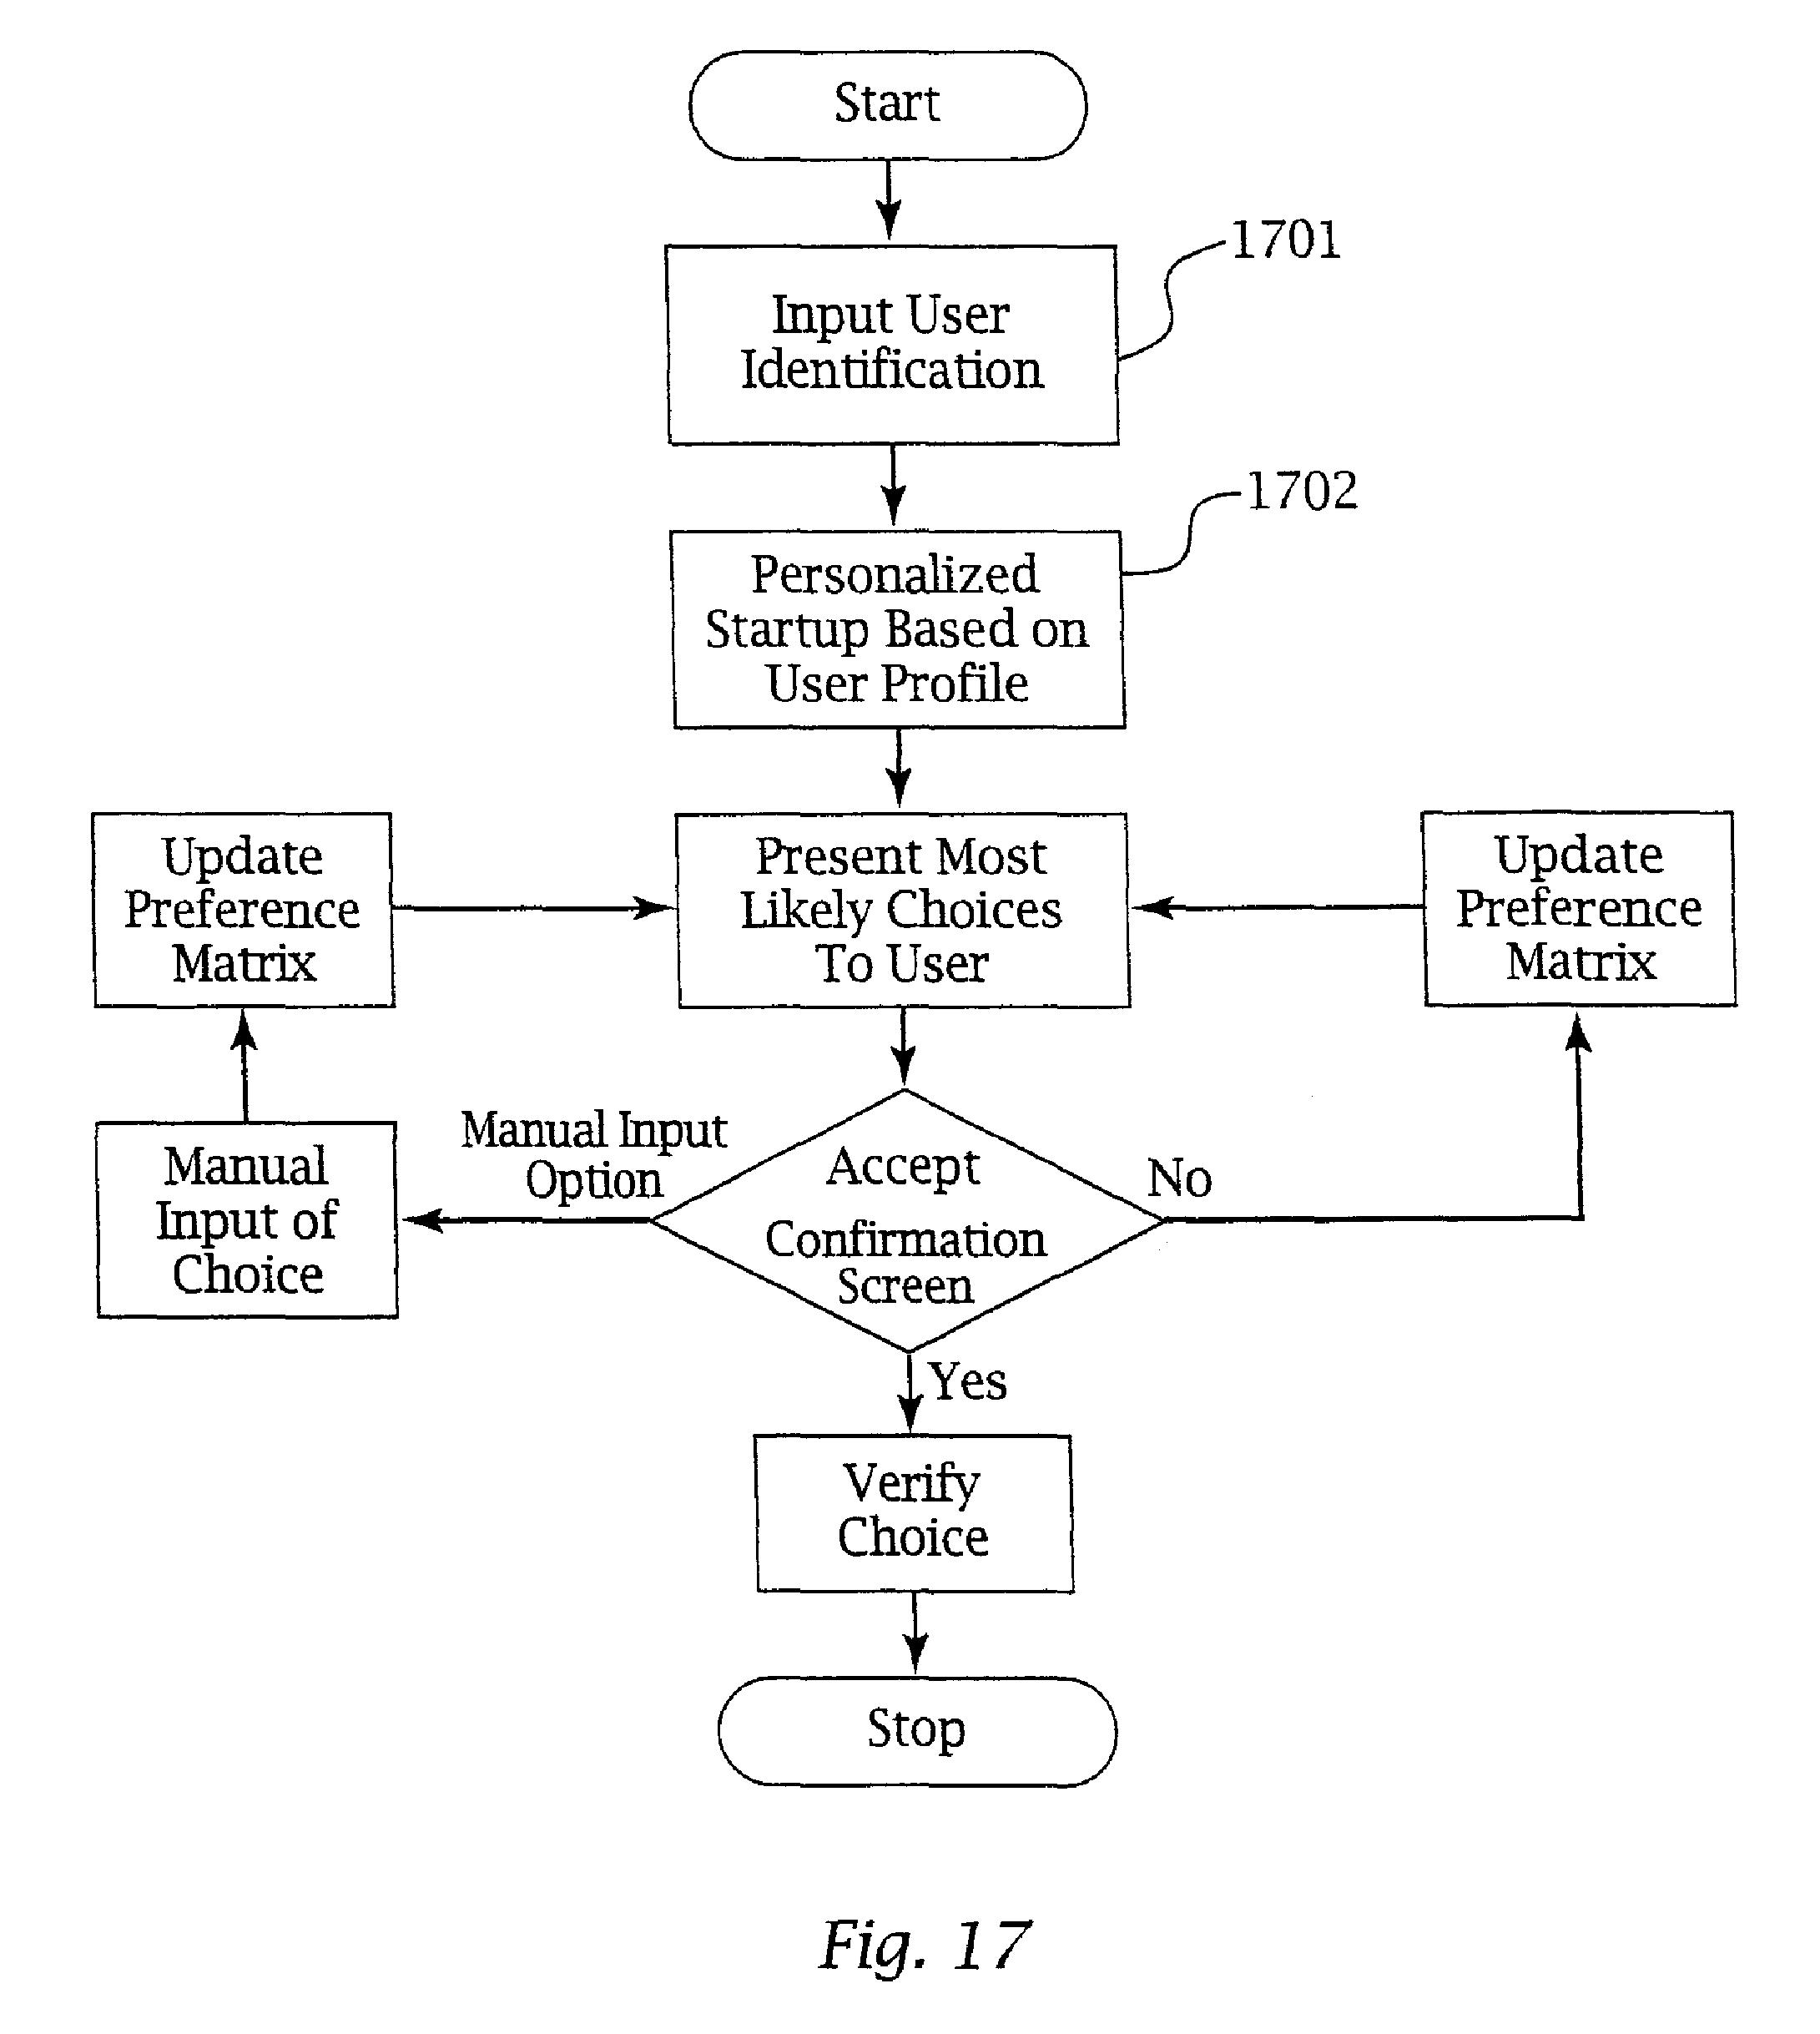 Patent US 8,892,495 B2